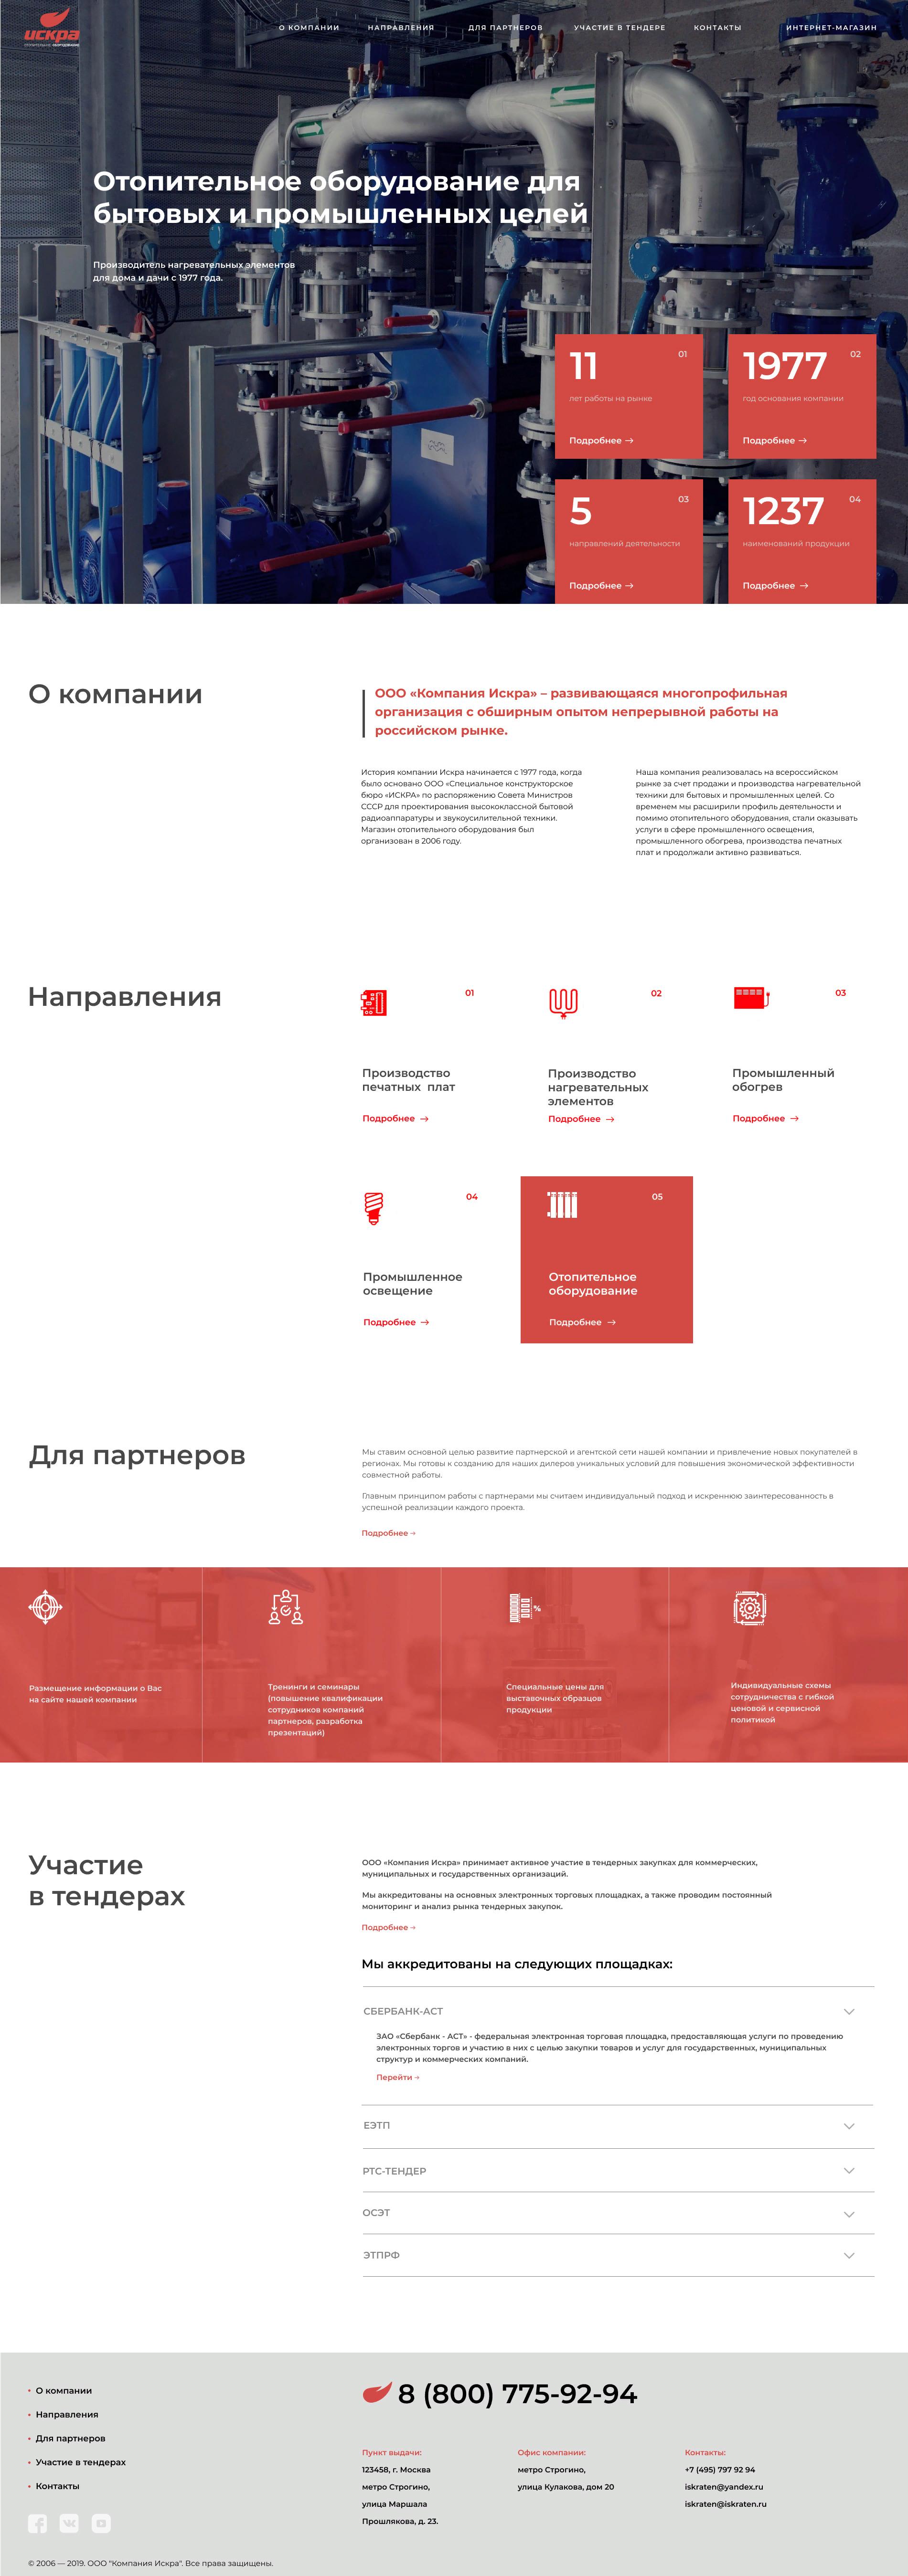 Дизайн сайта-визитки компании фото f_2645d26033b15862.jpg